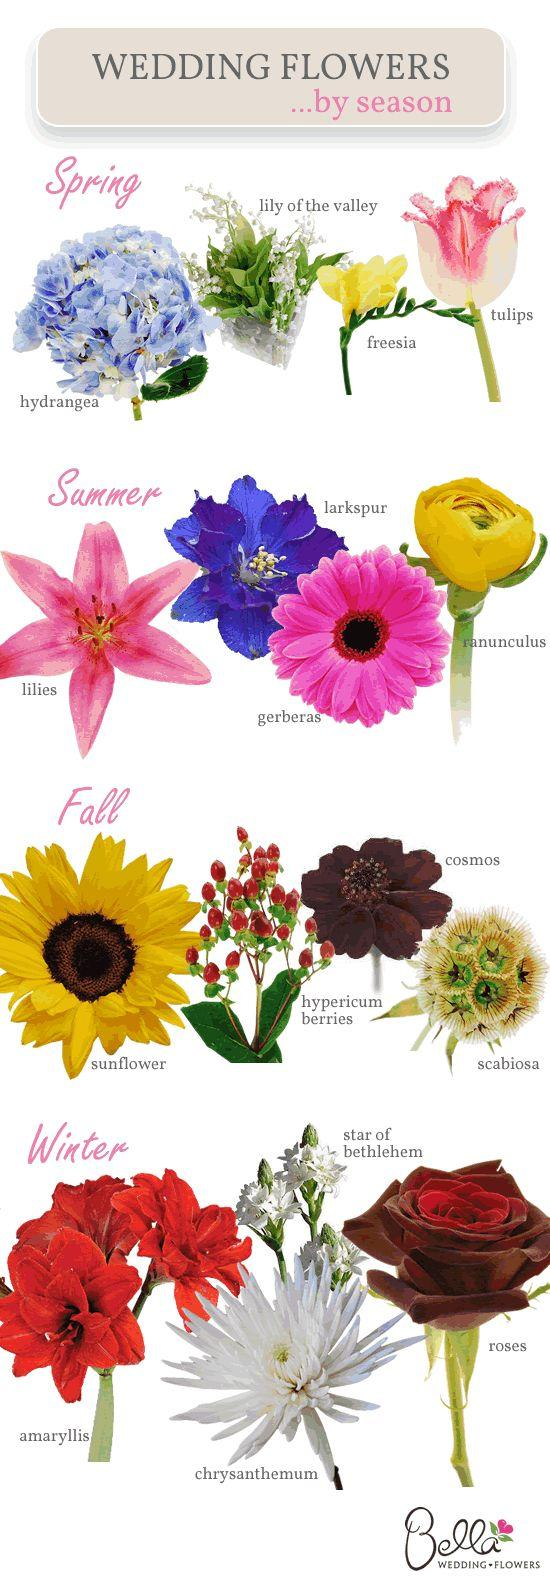 Wedding - Which Wedding Flowers Are In Season When?